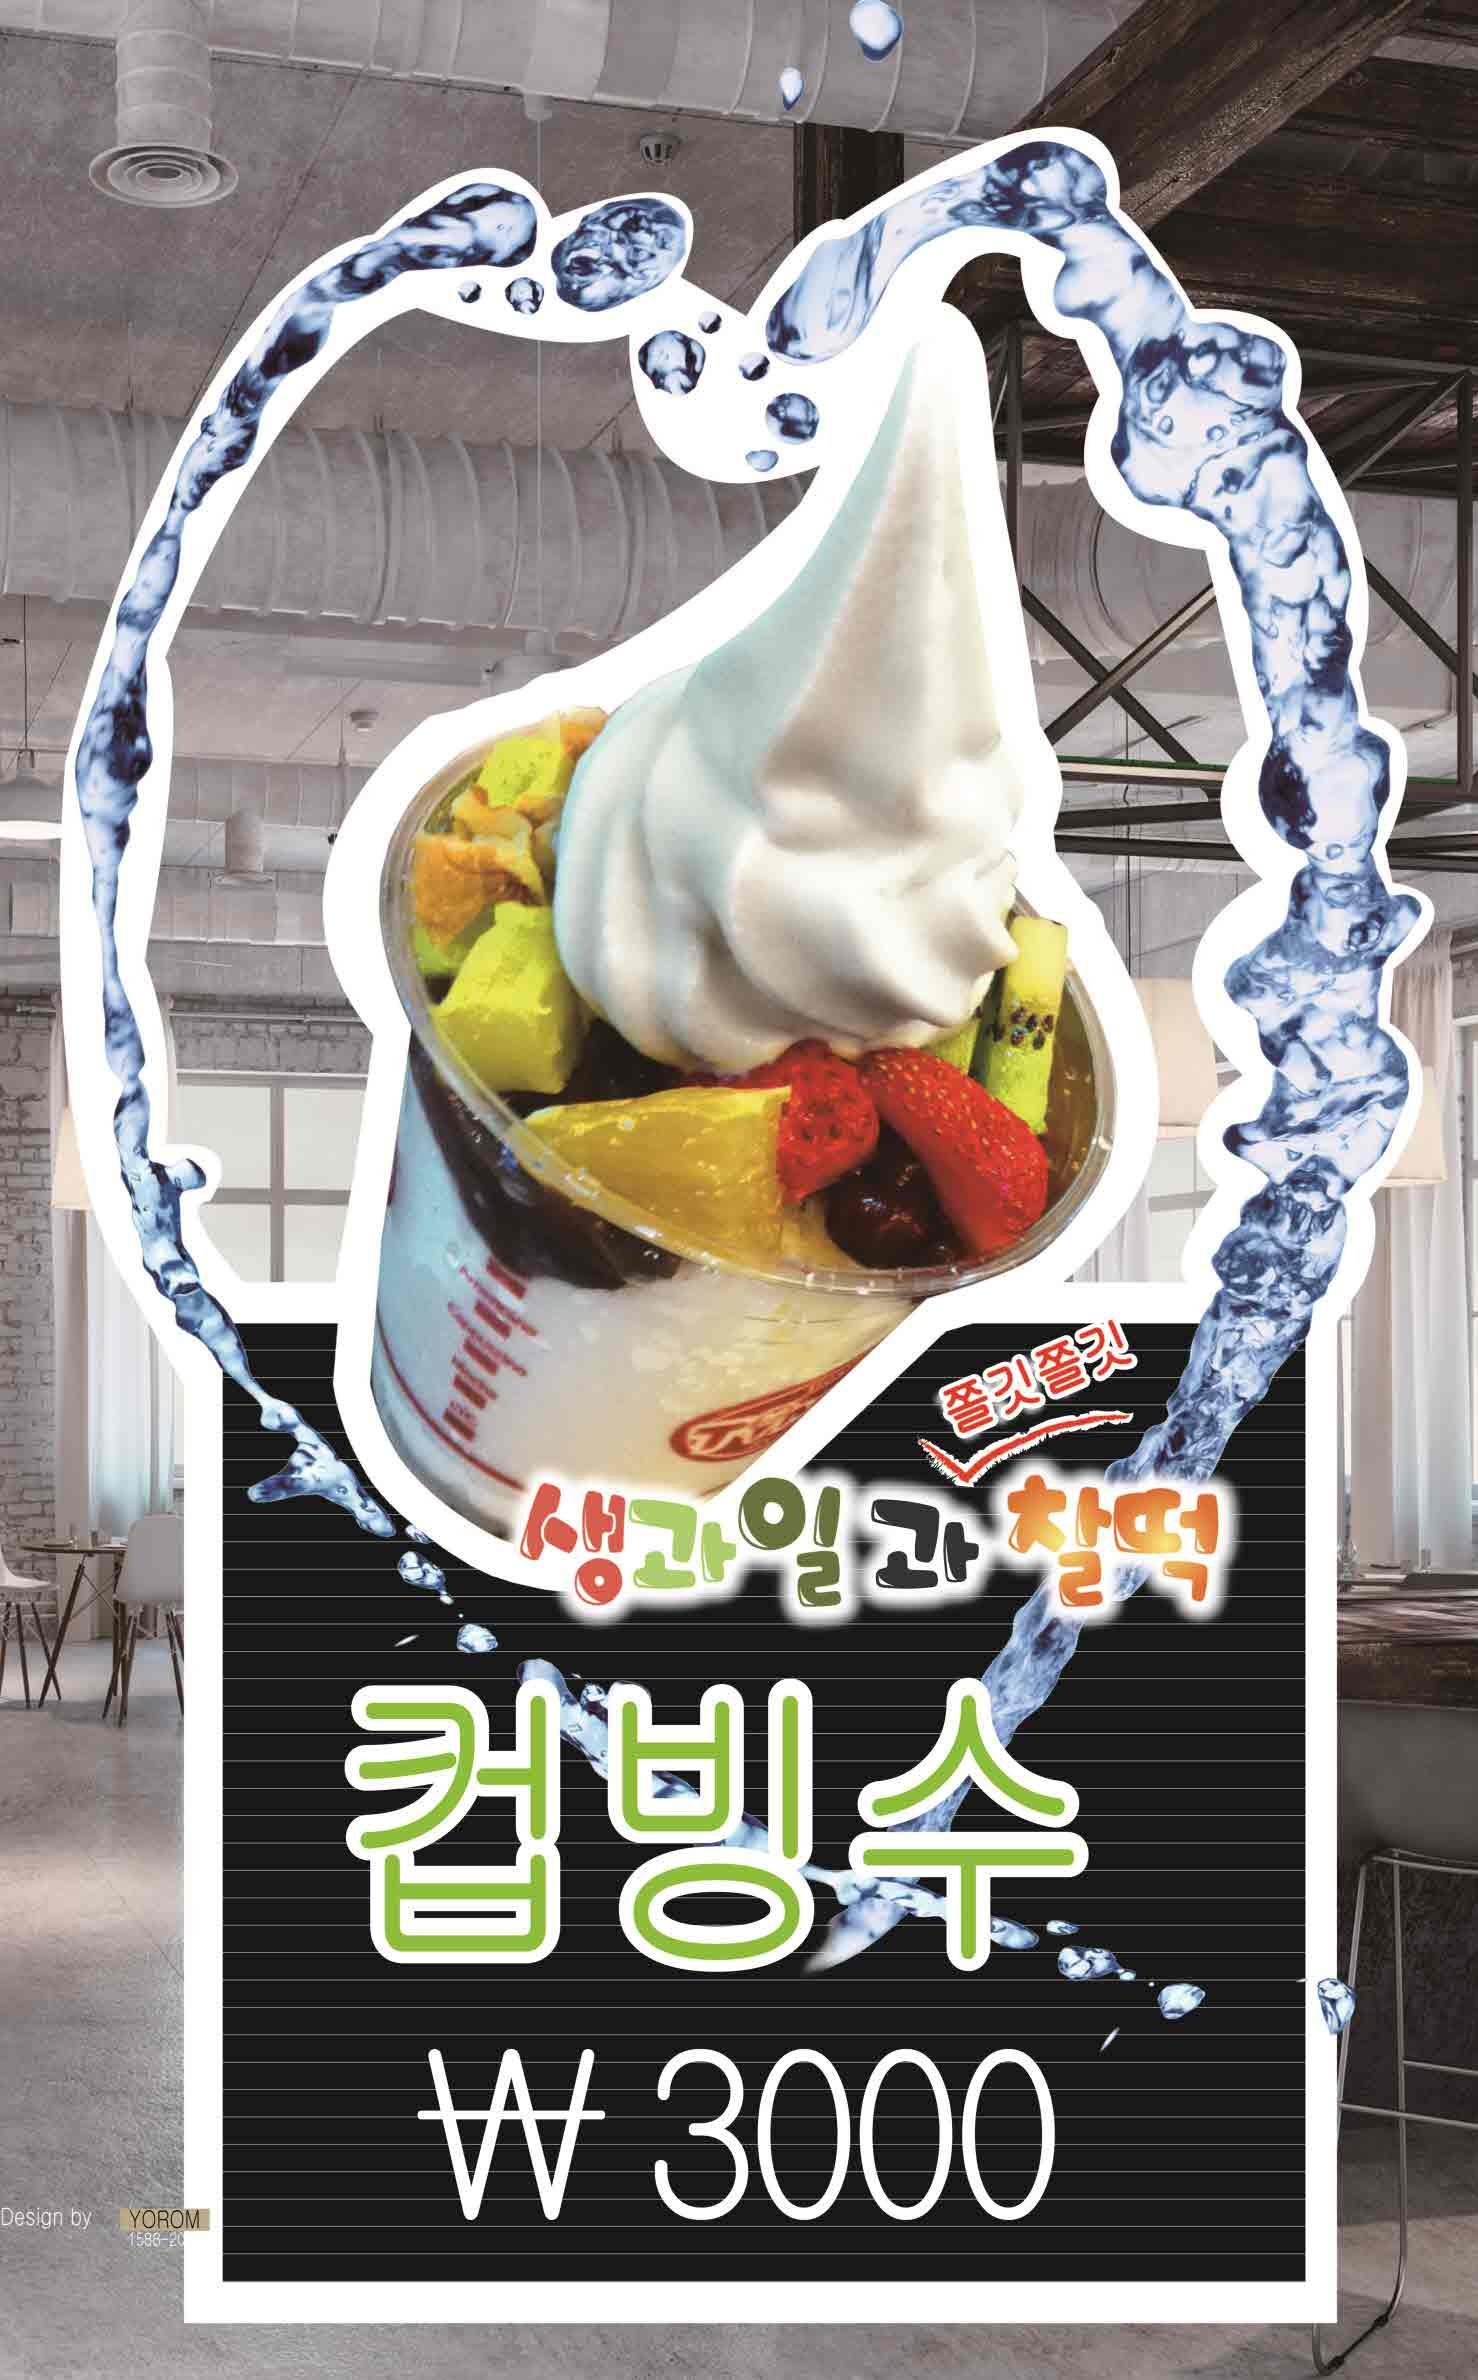 250K_컵빙수 팝업 배너 POP-UP BANNER 01-01.jpg